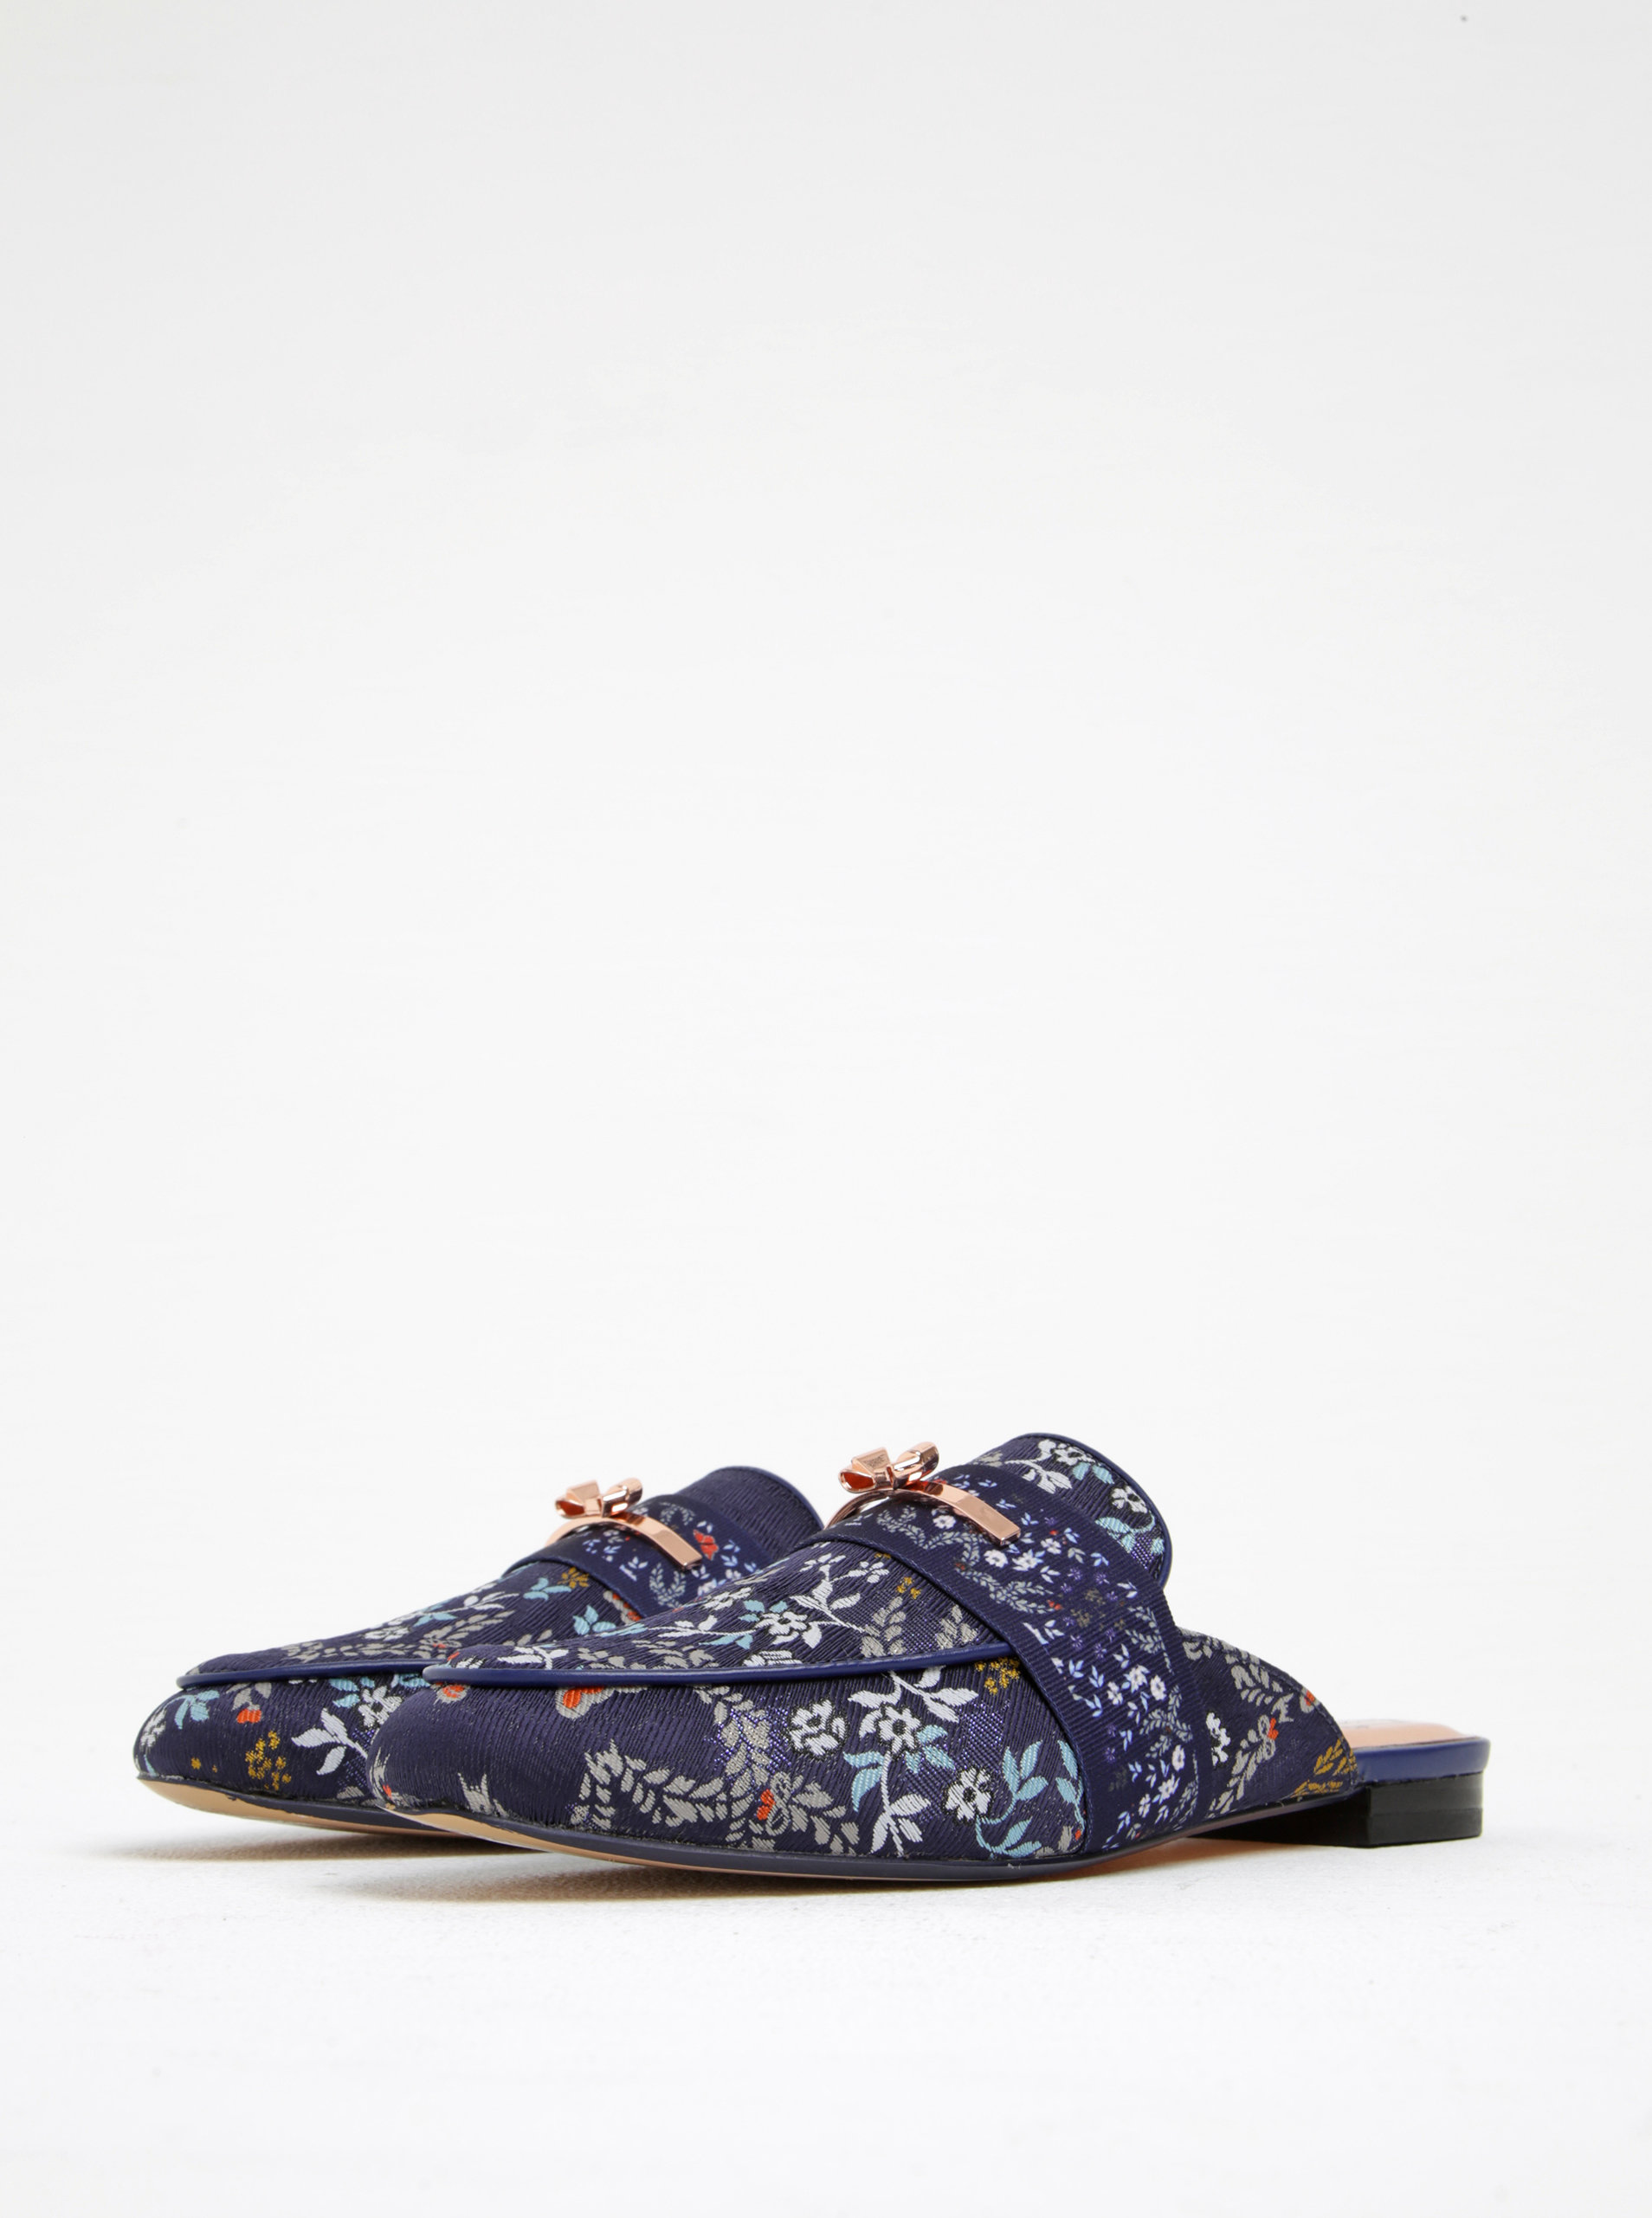 aff889453faa Modré kvetinové šľapky Ted Baker Dorlinj ...